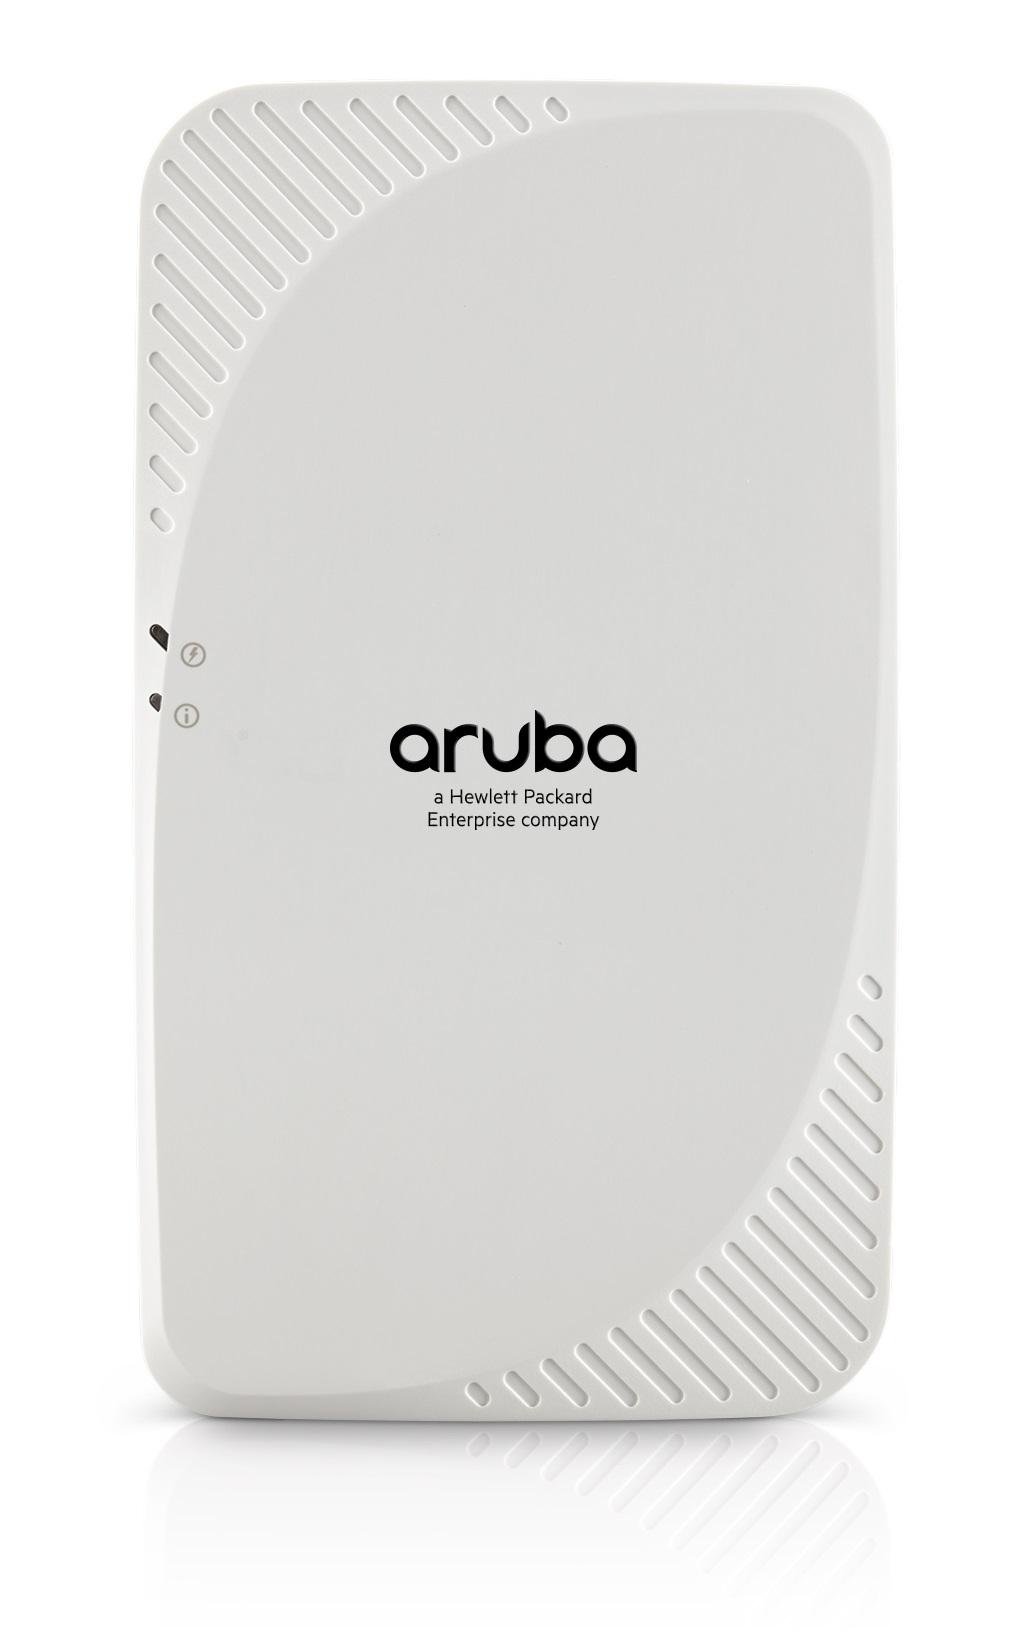 Aruba AP-205H Wireless AP - Hospitality